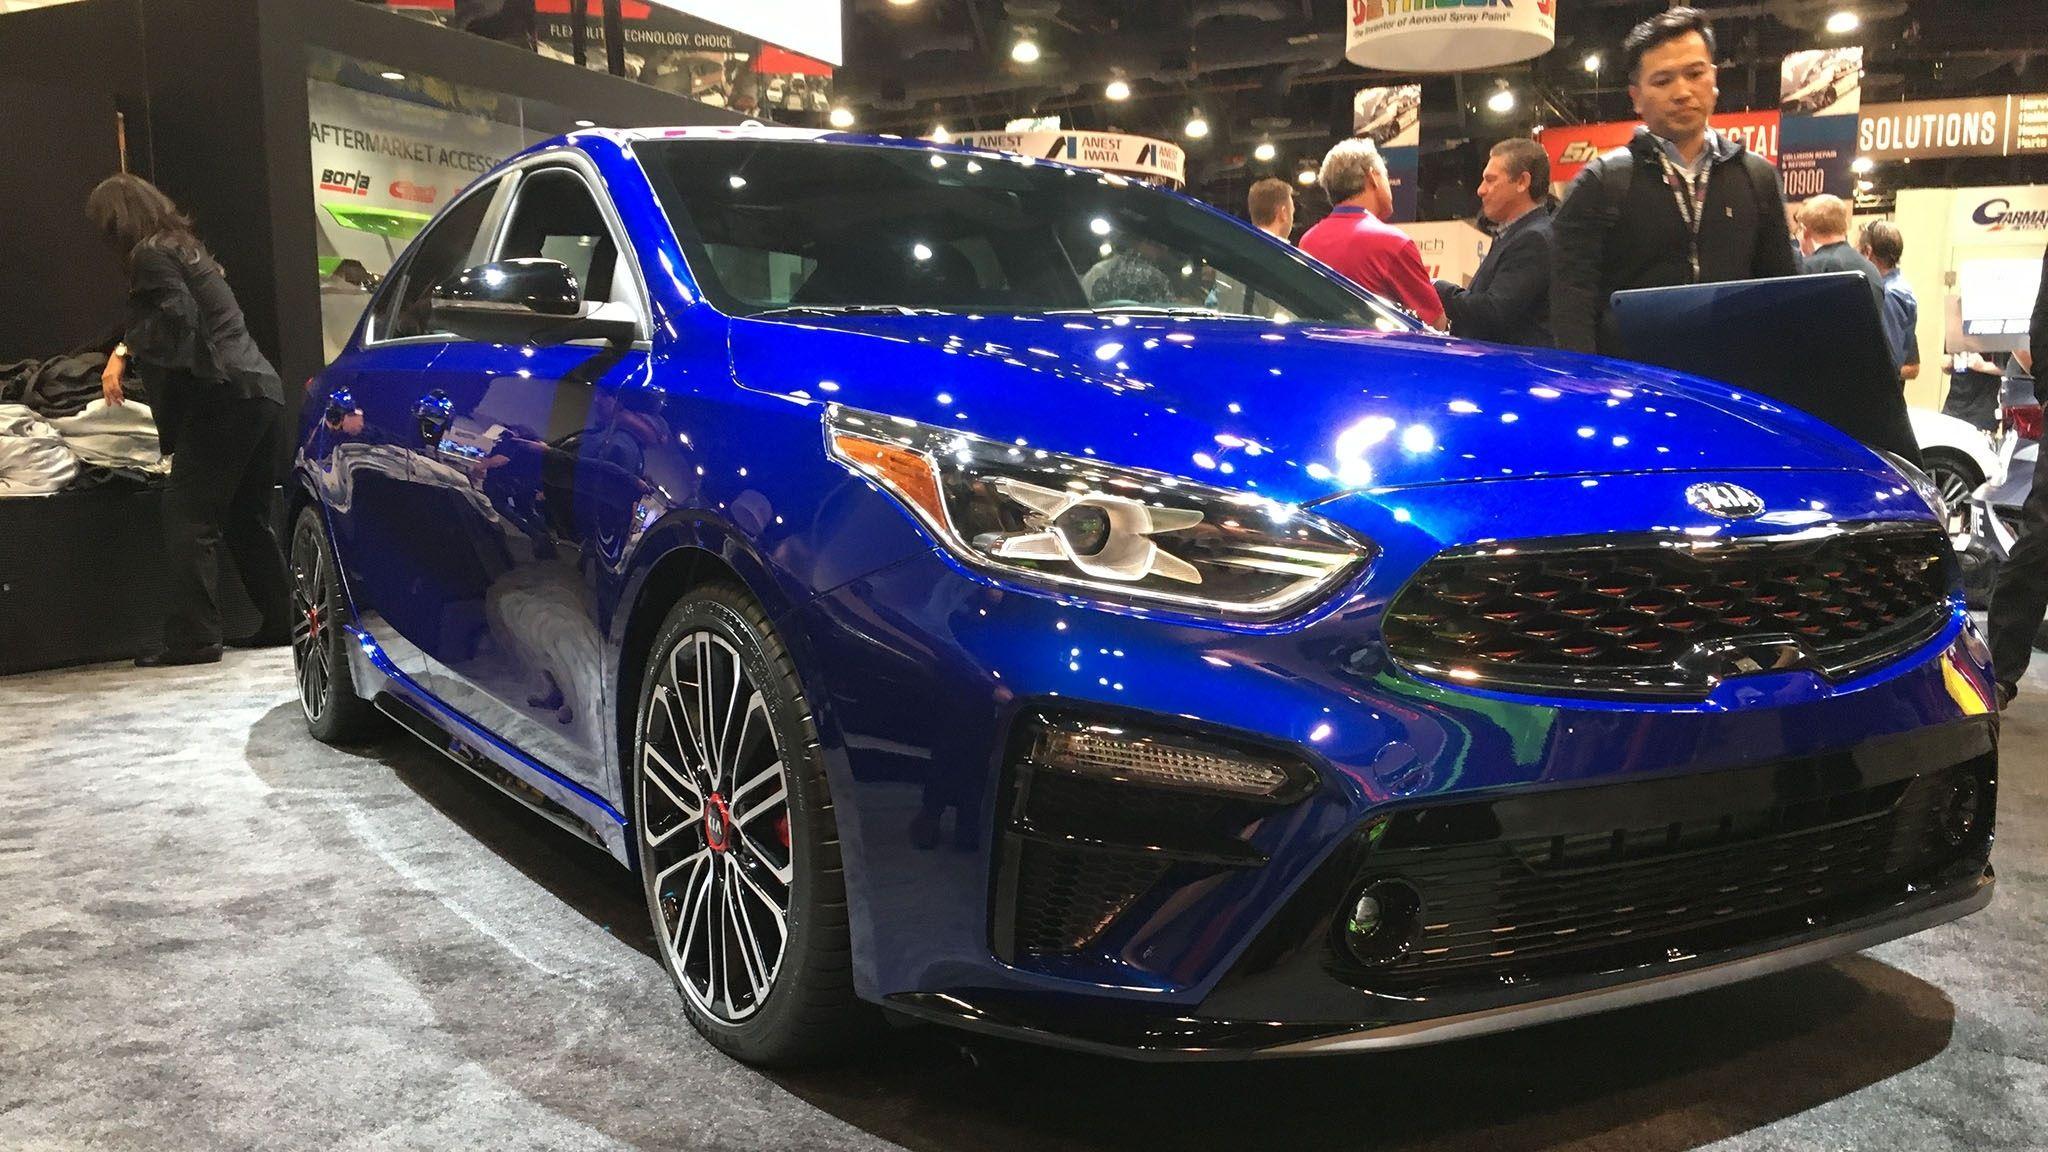 2020 Kia Sorento Changes Redesign And Price Rumors New Car Rumor